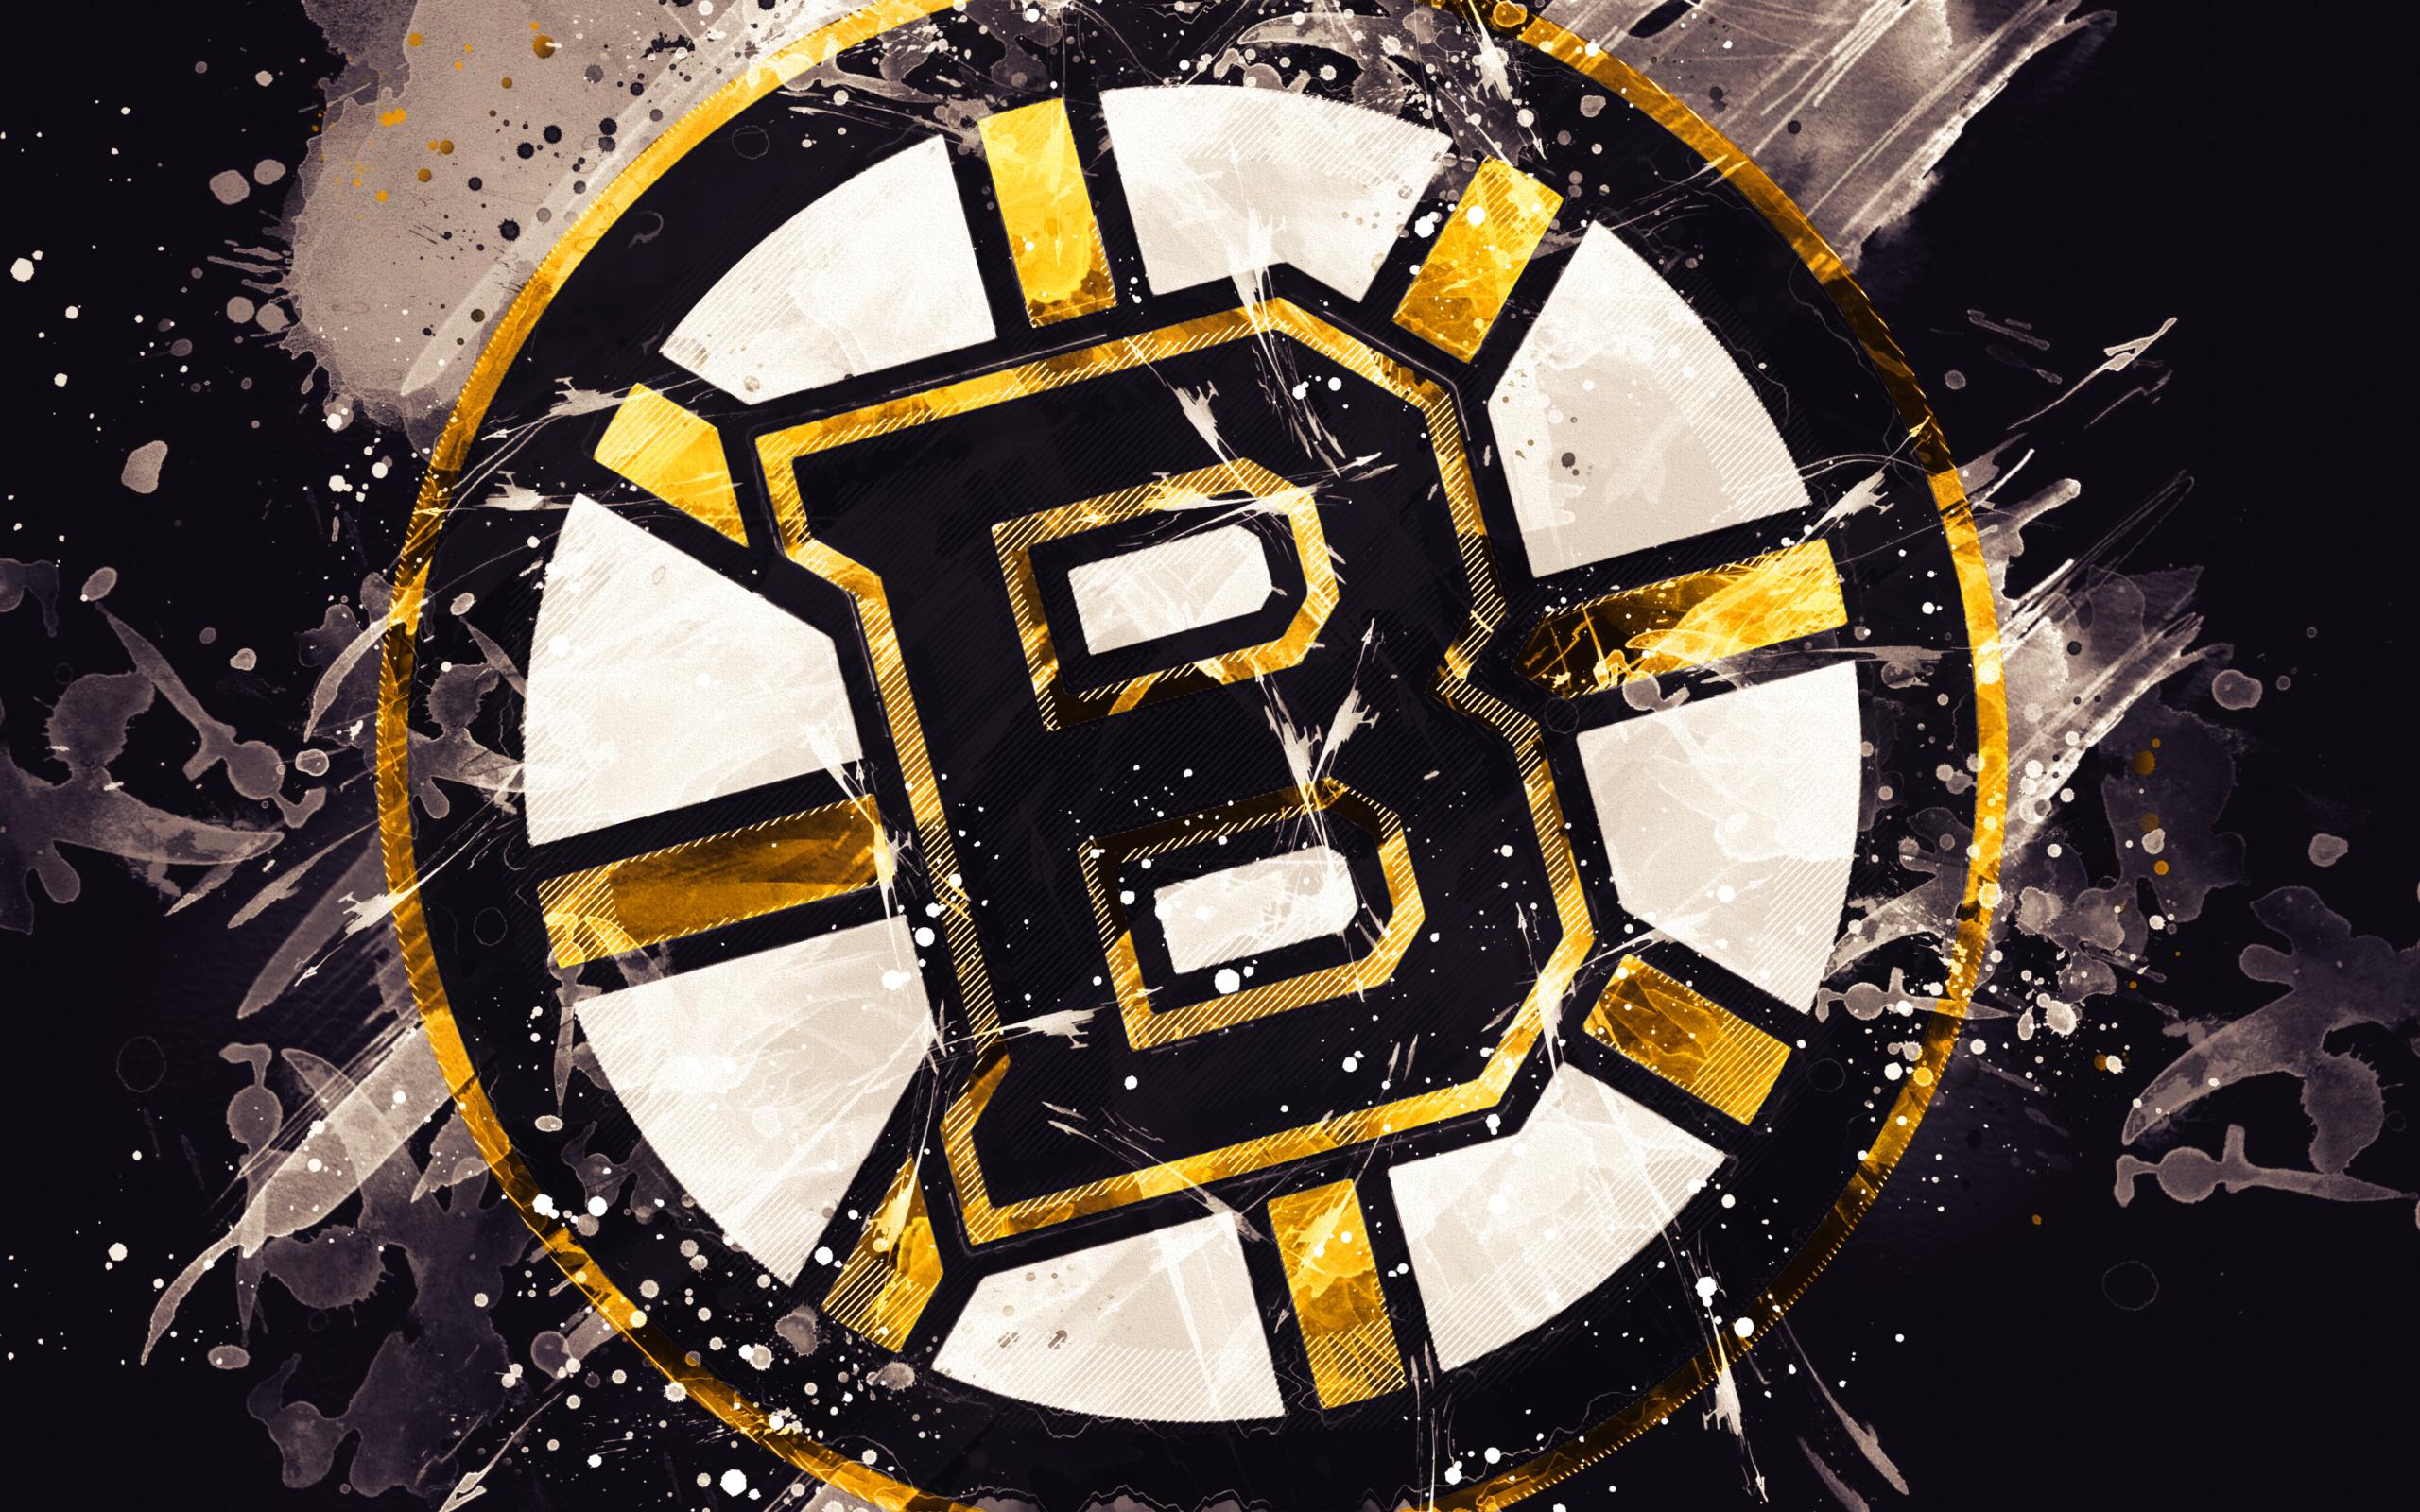 Downloading Best Boston Bruins Wallpaper Ideas